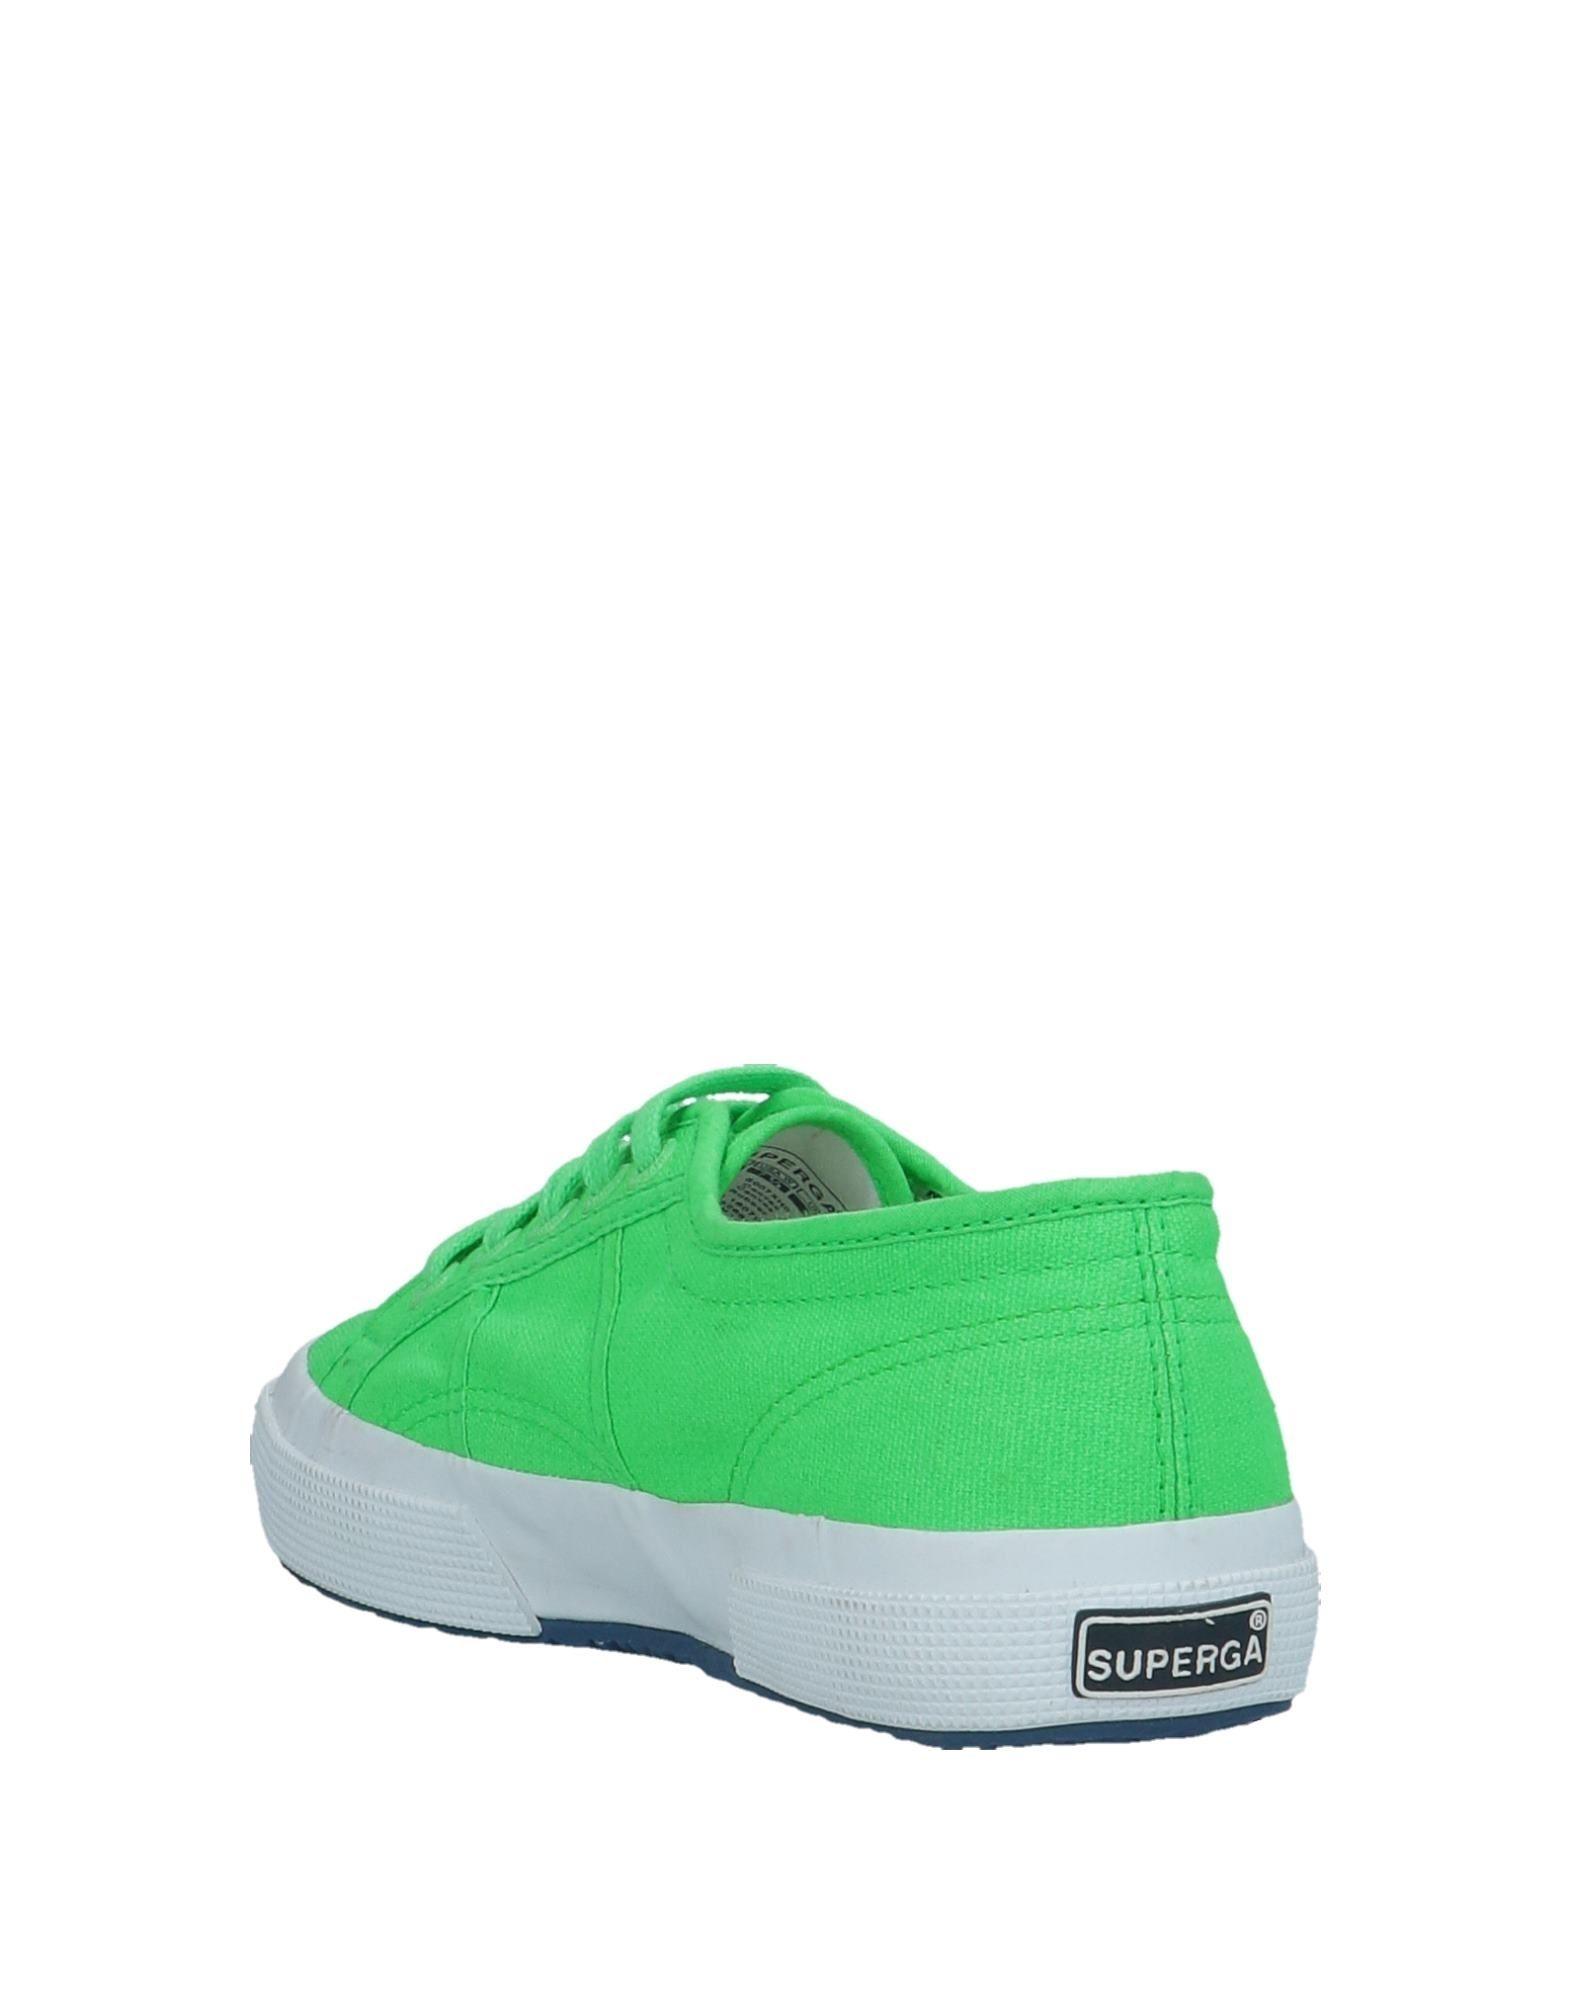 Superga® Sneakers Damen  11538231KT 11538231KT   597934